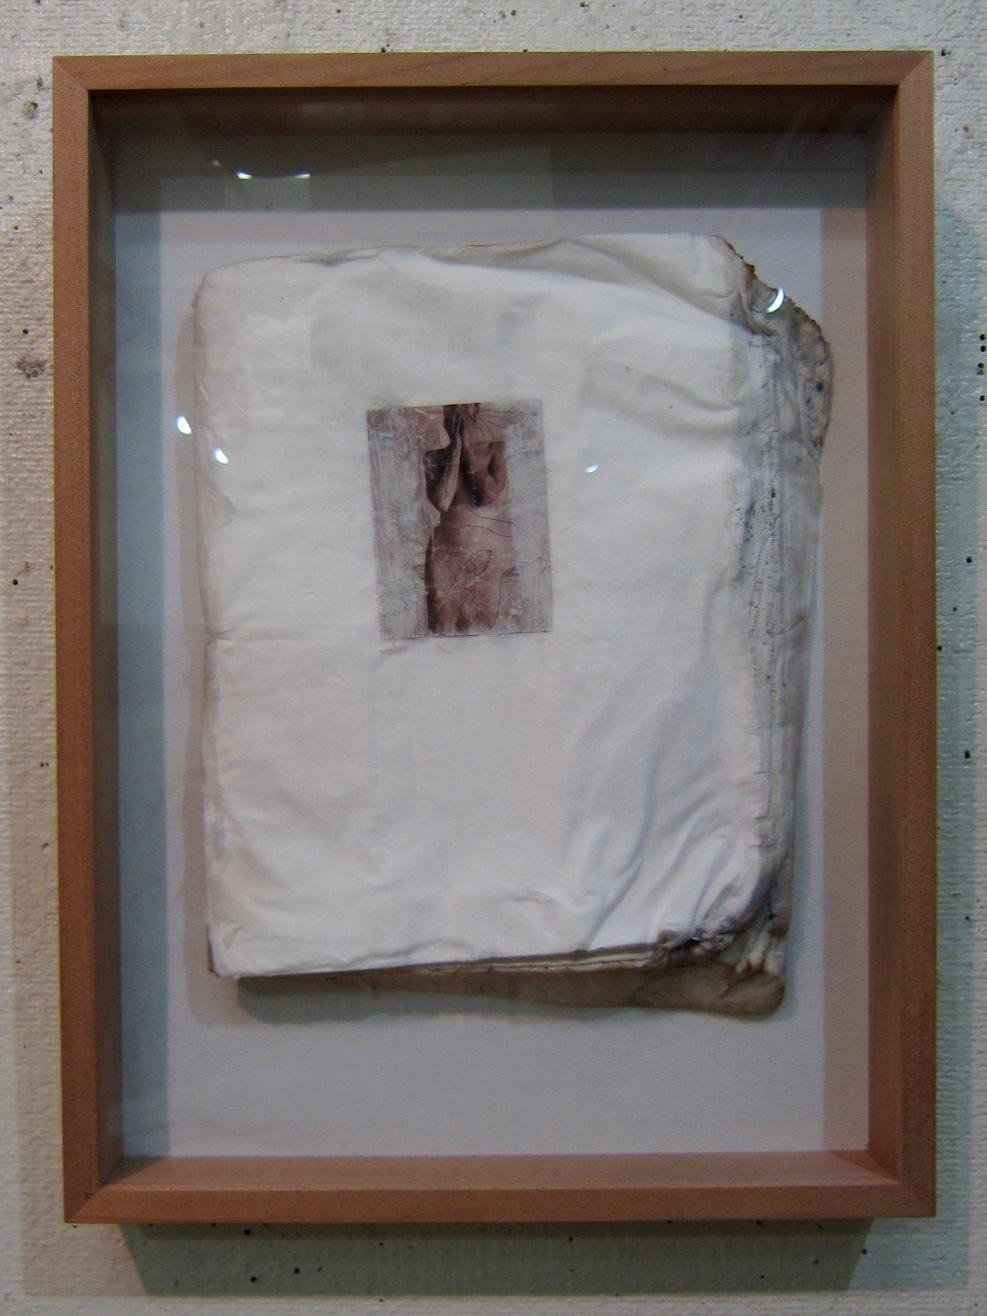 2408) 「BOOK\'S ART  9th」 たぴお 7月7日(月)~7月12日(土)_f0126829_23454375.jpg